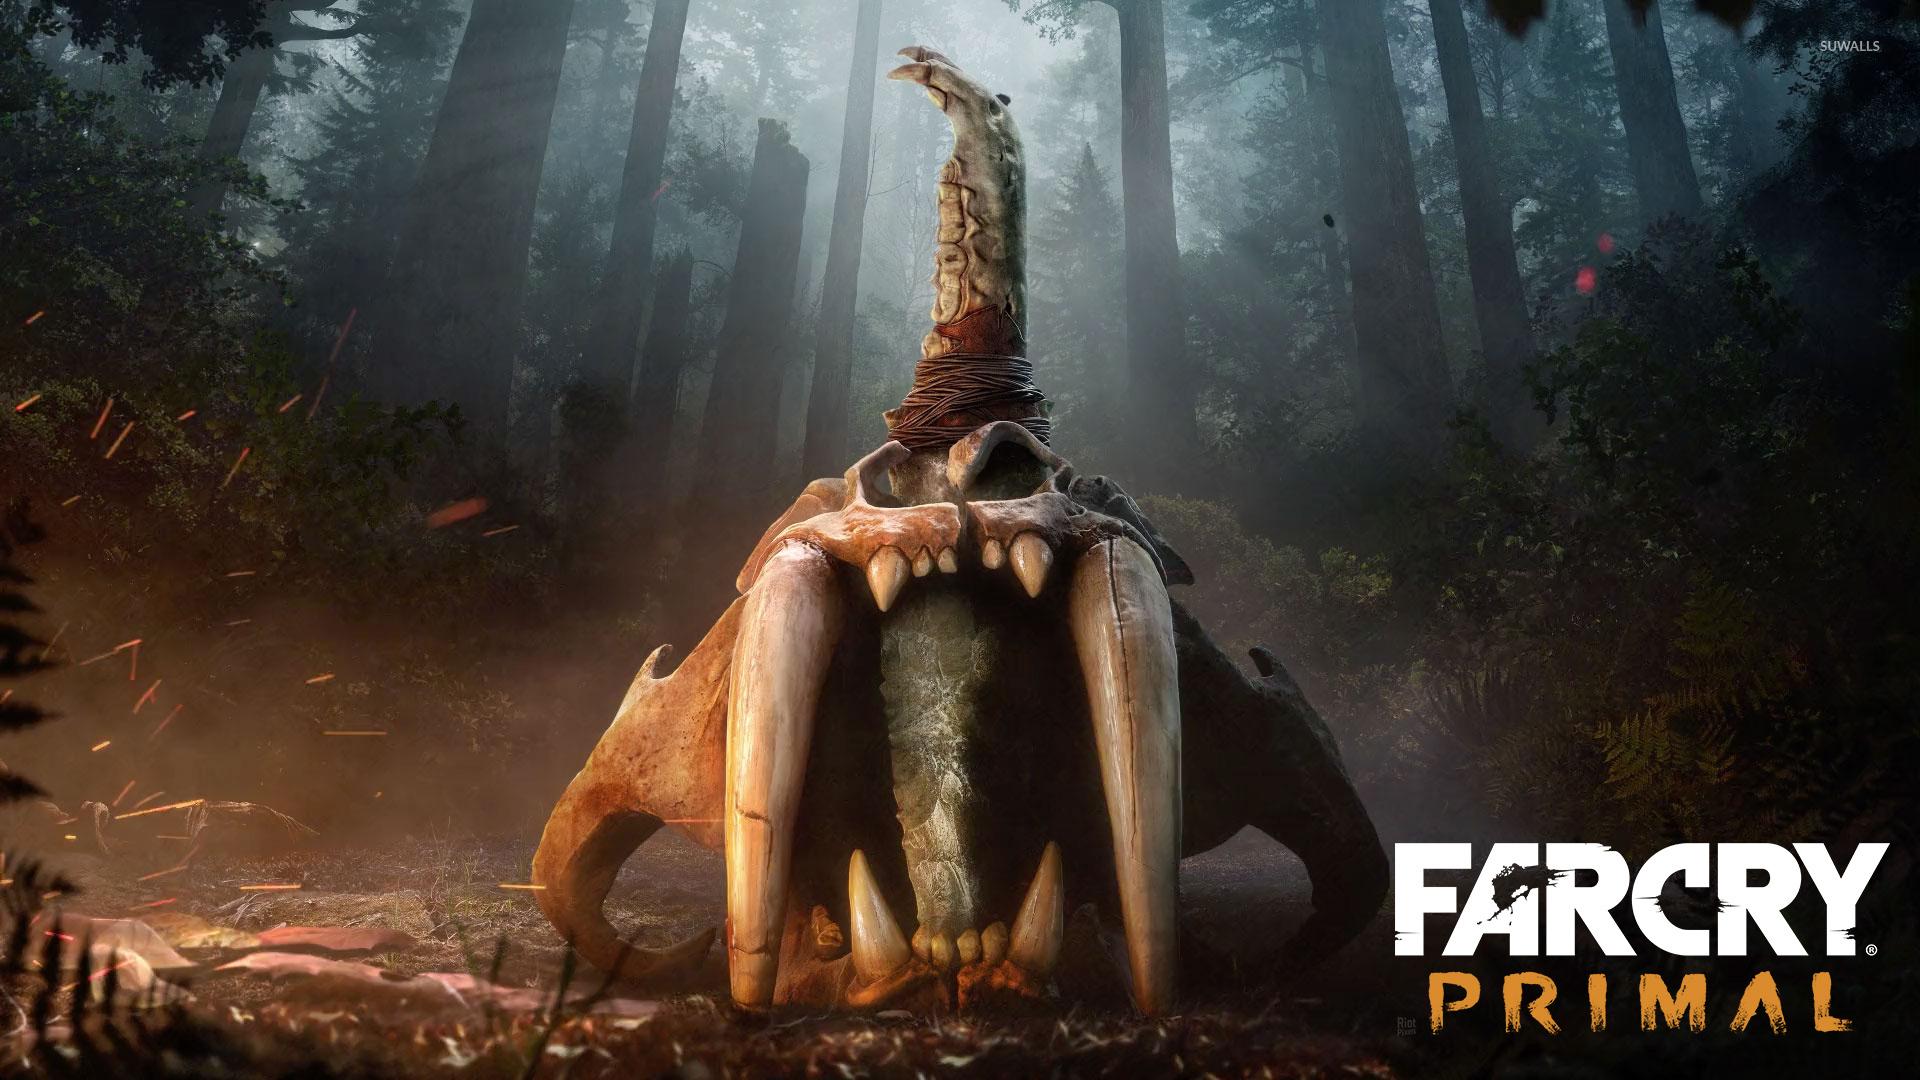 Far Cry Primal Totem Wallpaper Game Wallpapers 52698